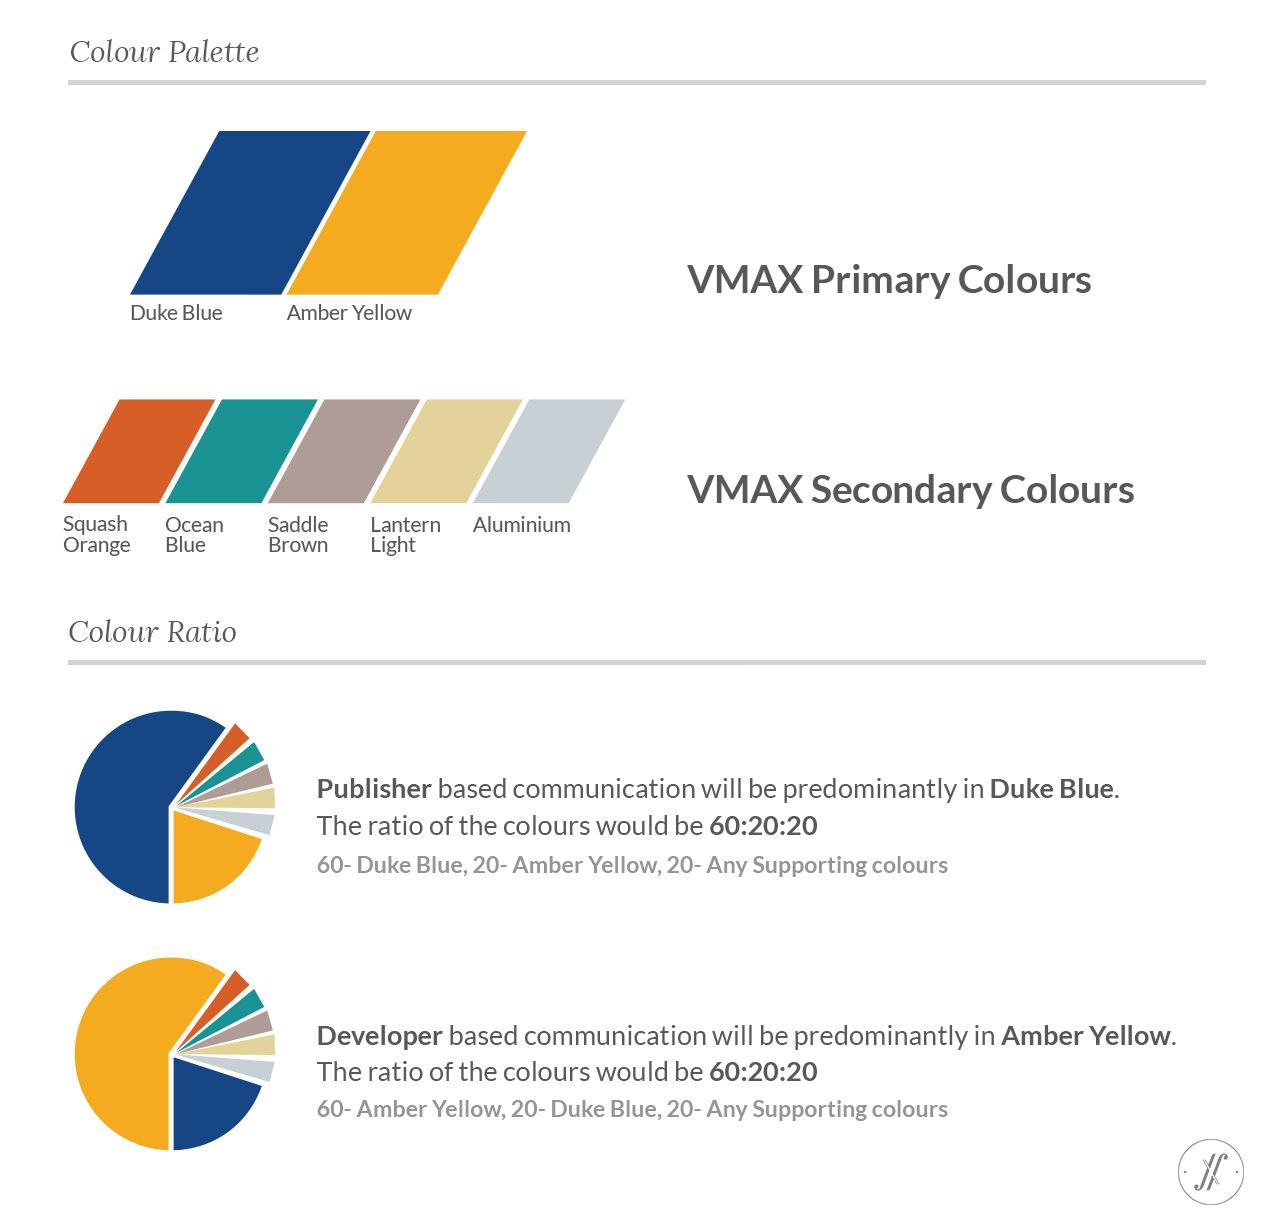 Yellow Fishes Branding Agency In Mumbai & Singapore VMAX Technology Branding Visual Brand Language Design - Brand Identity Design Defining Colour Palette